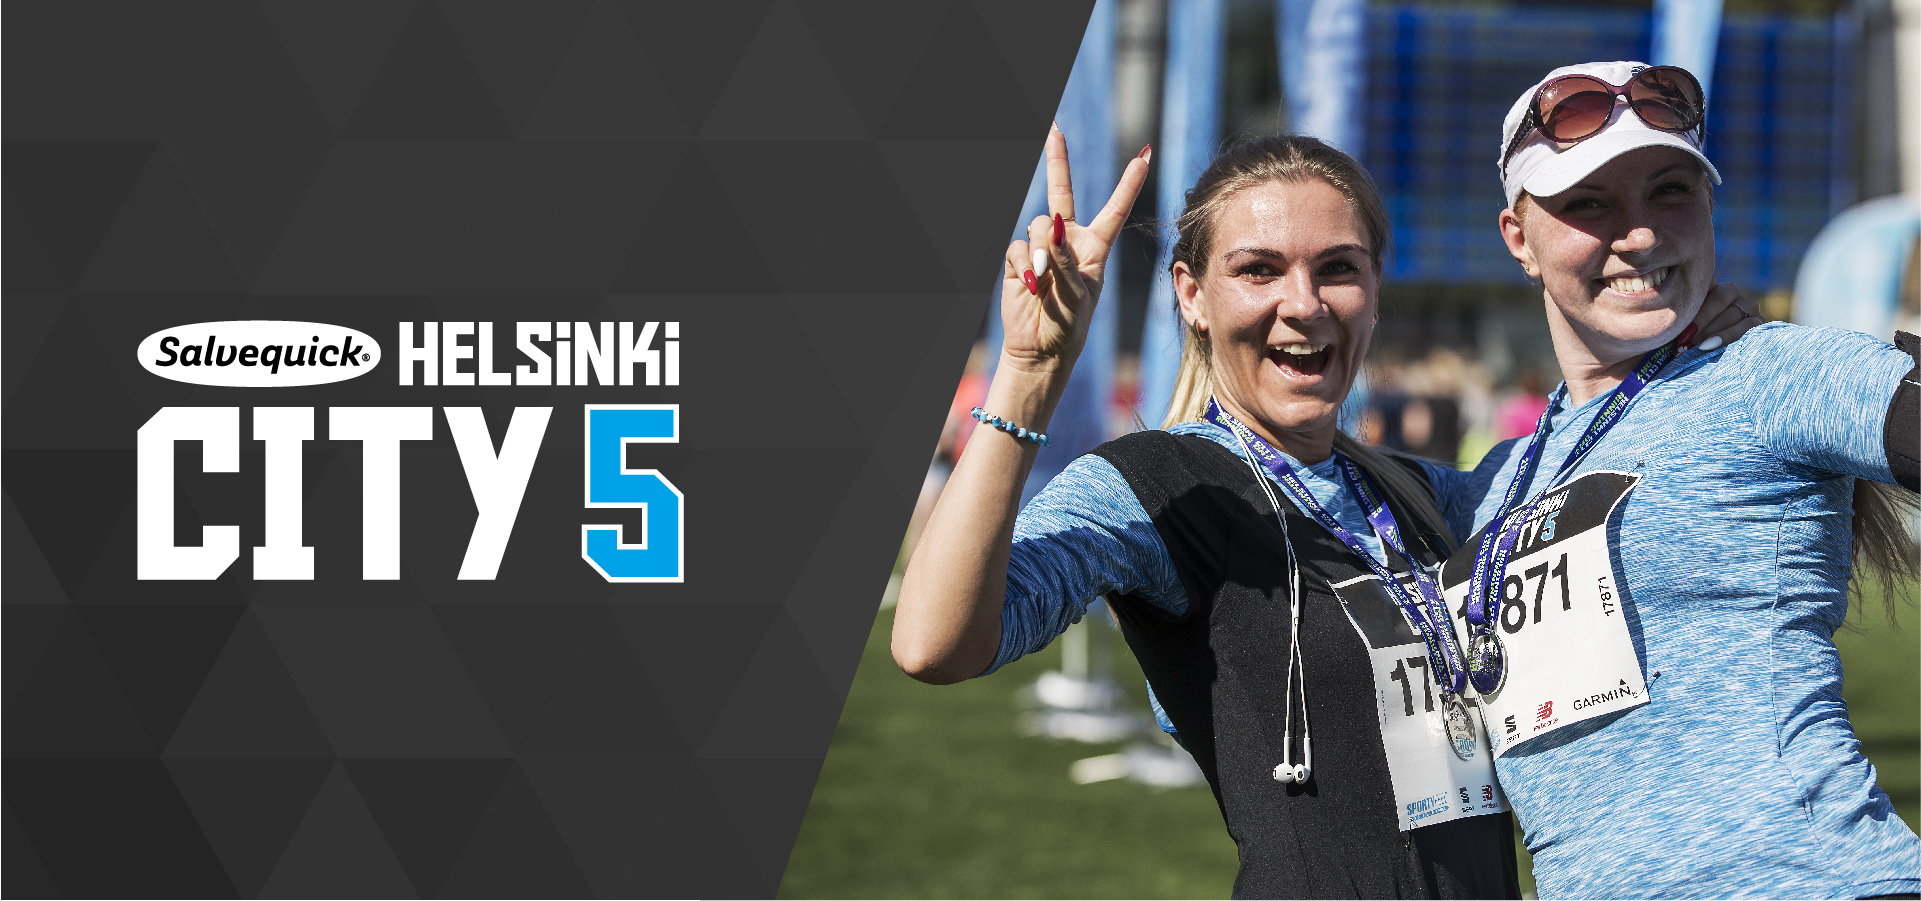 Helsinki 5 km run